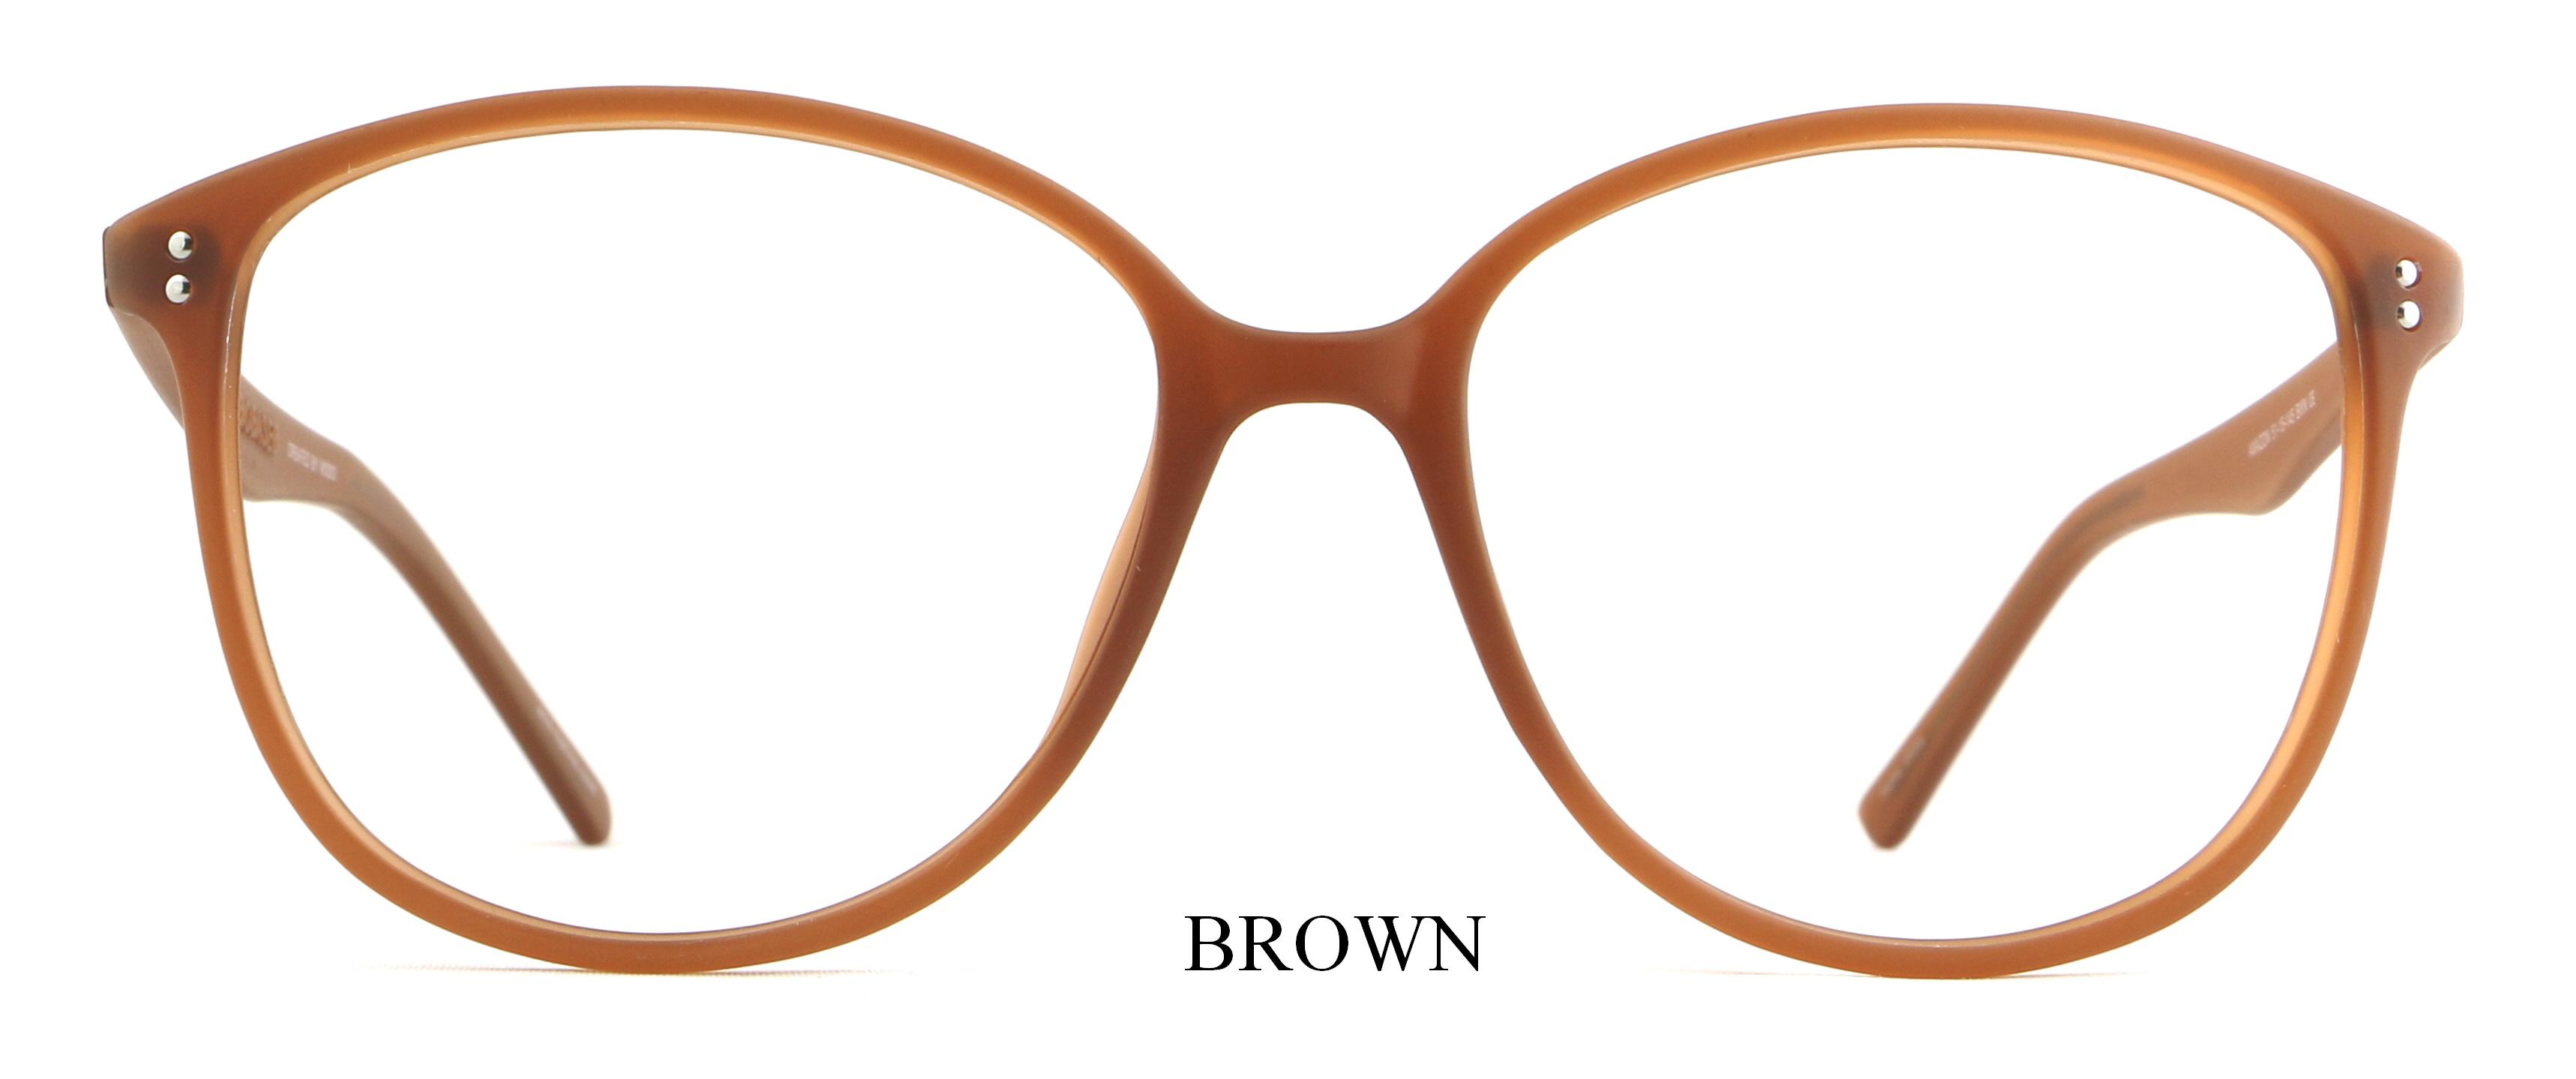 Wholesale eyeglasses | Eco Women | Eyewear4less.com